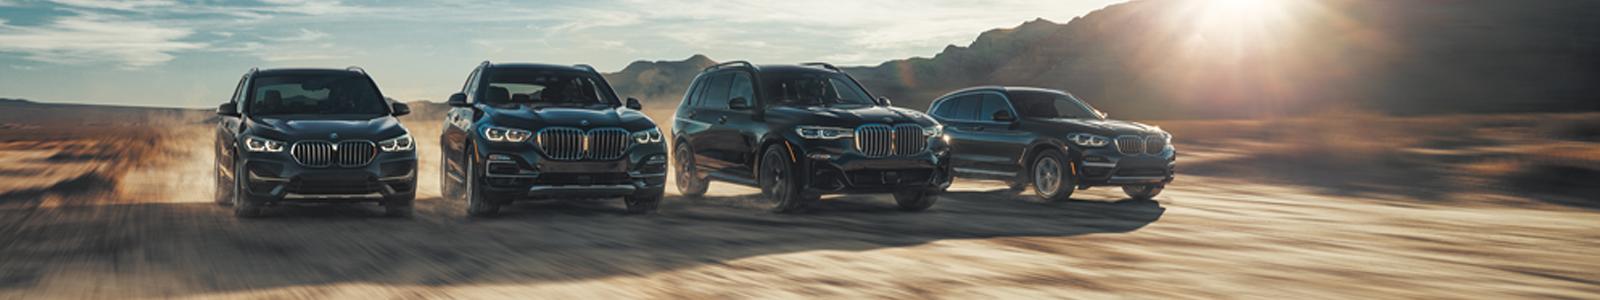 The BMW of Minnetonka Team